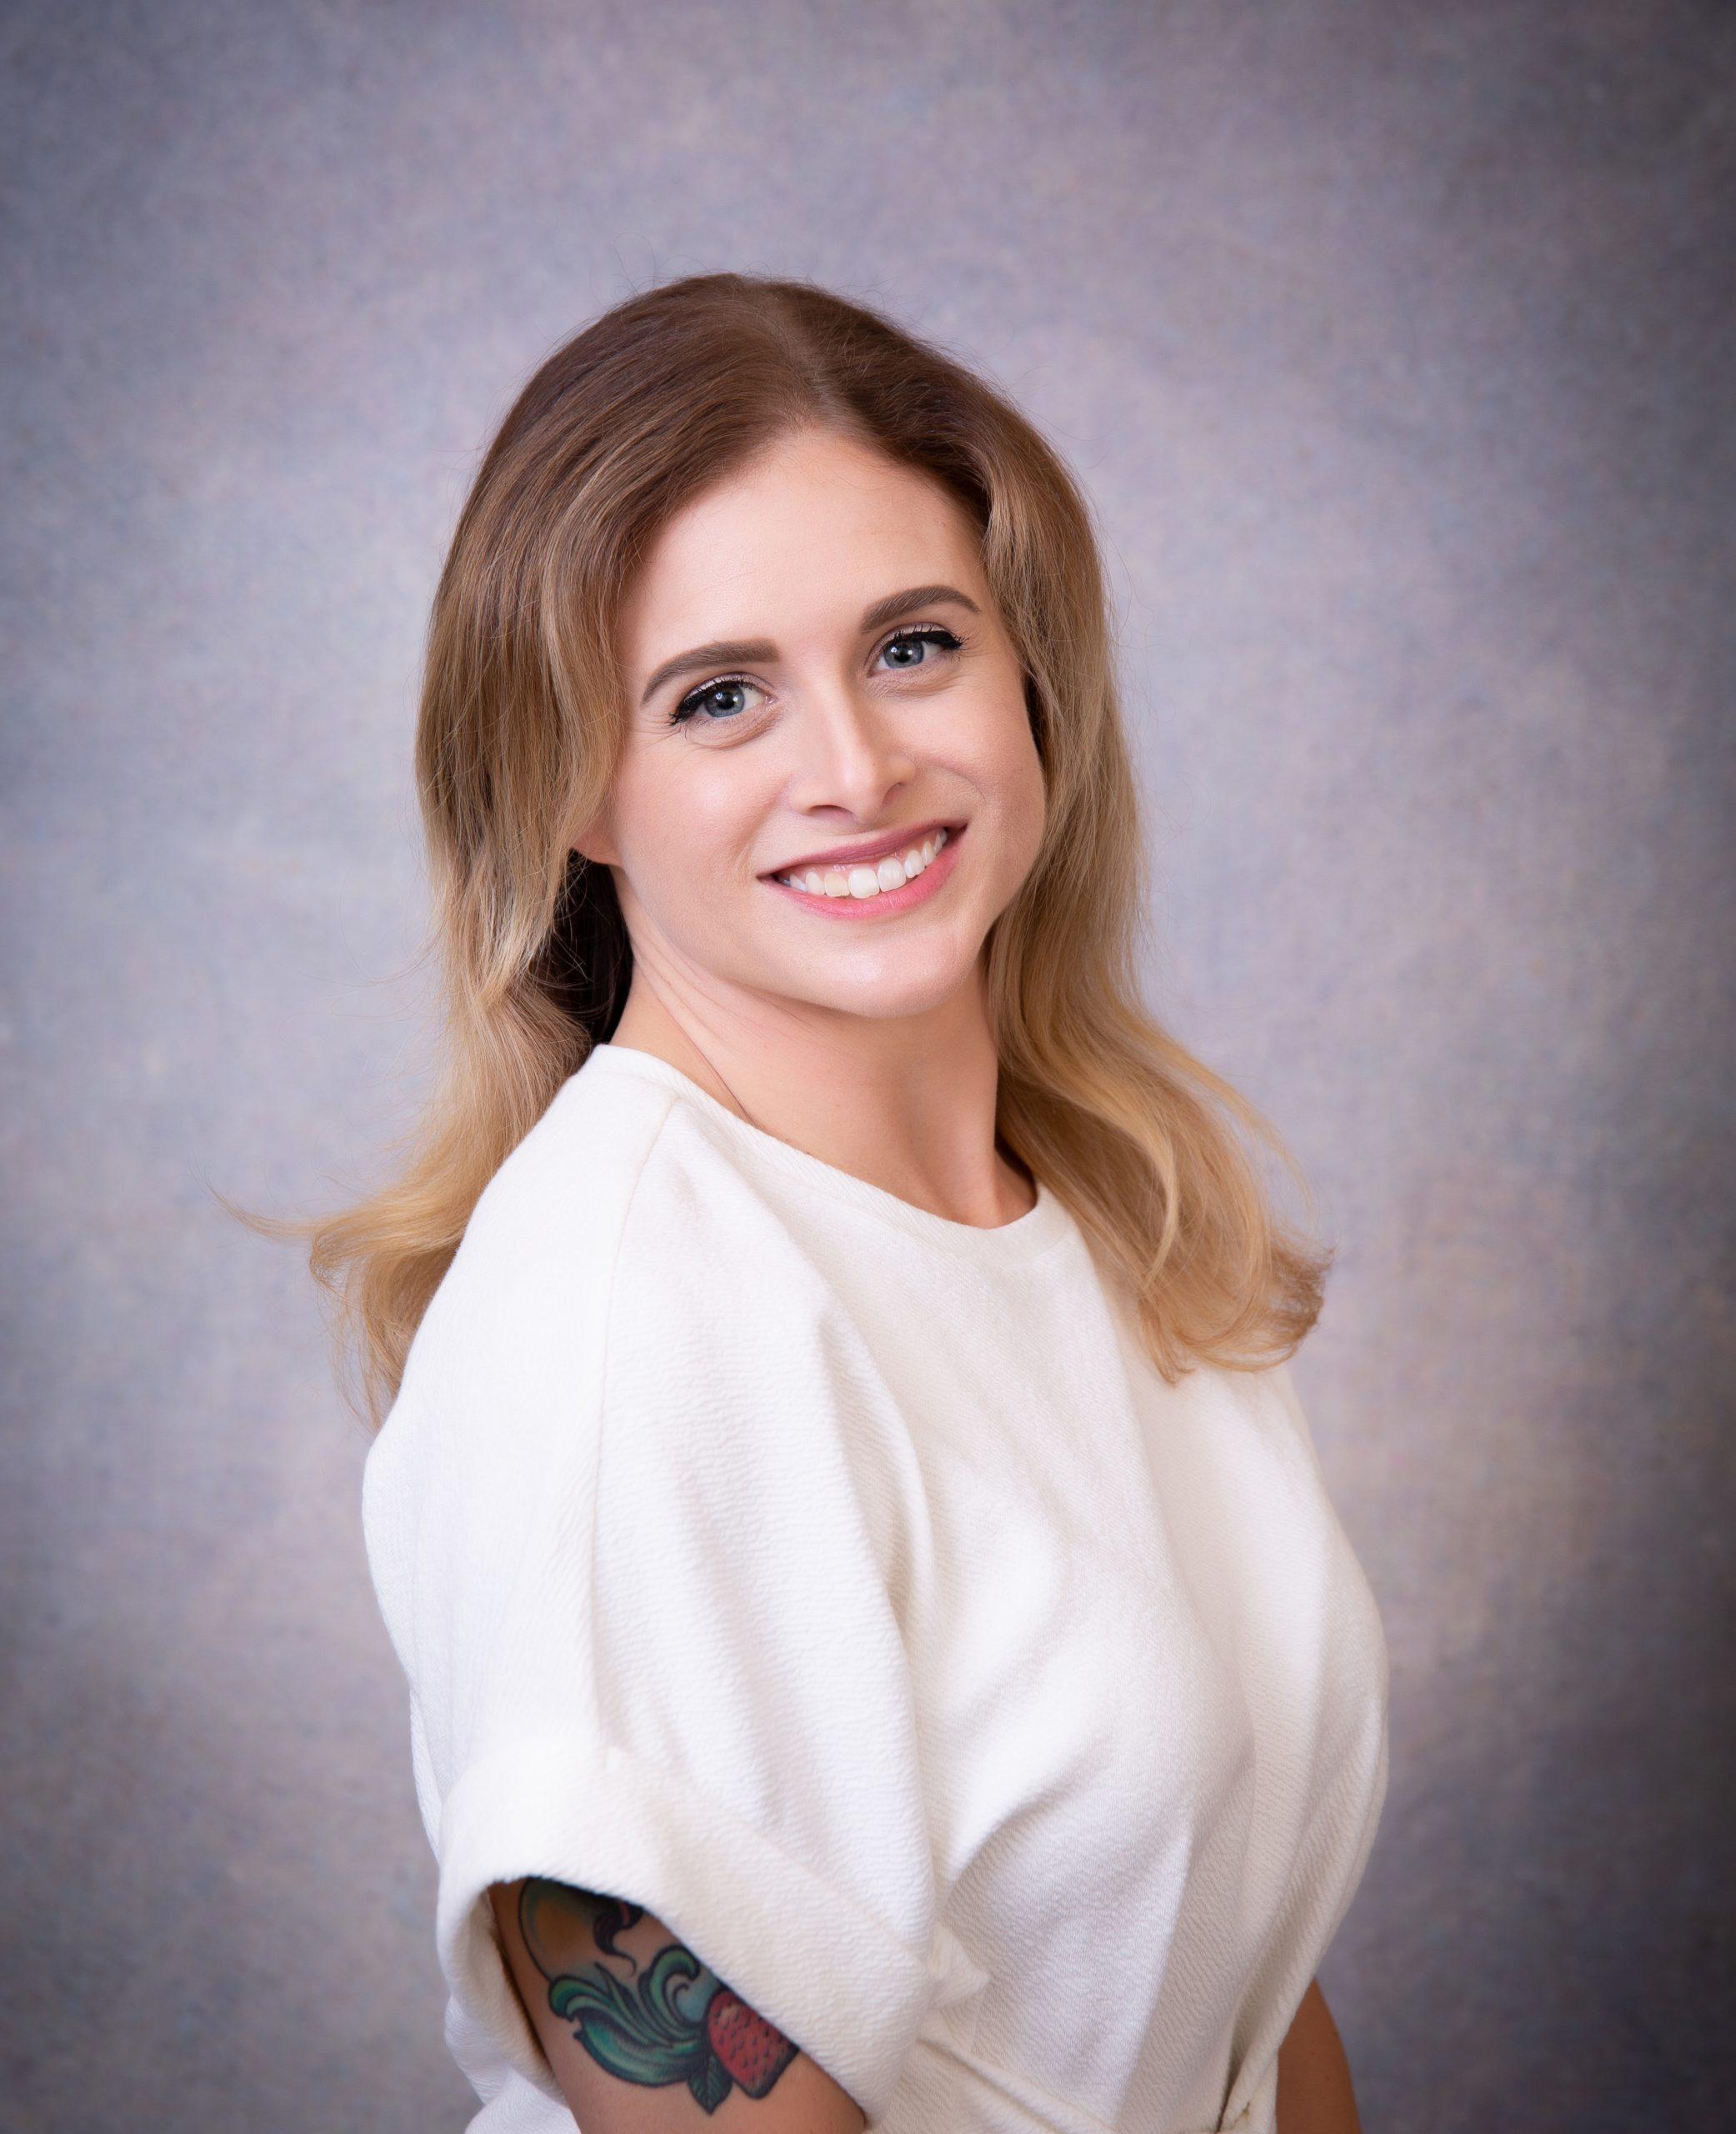 Chantal Prescott